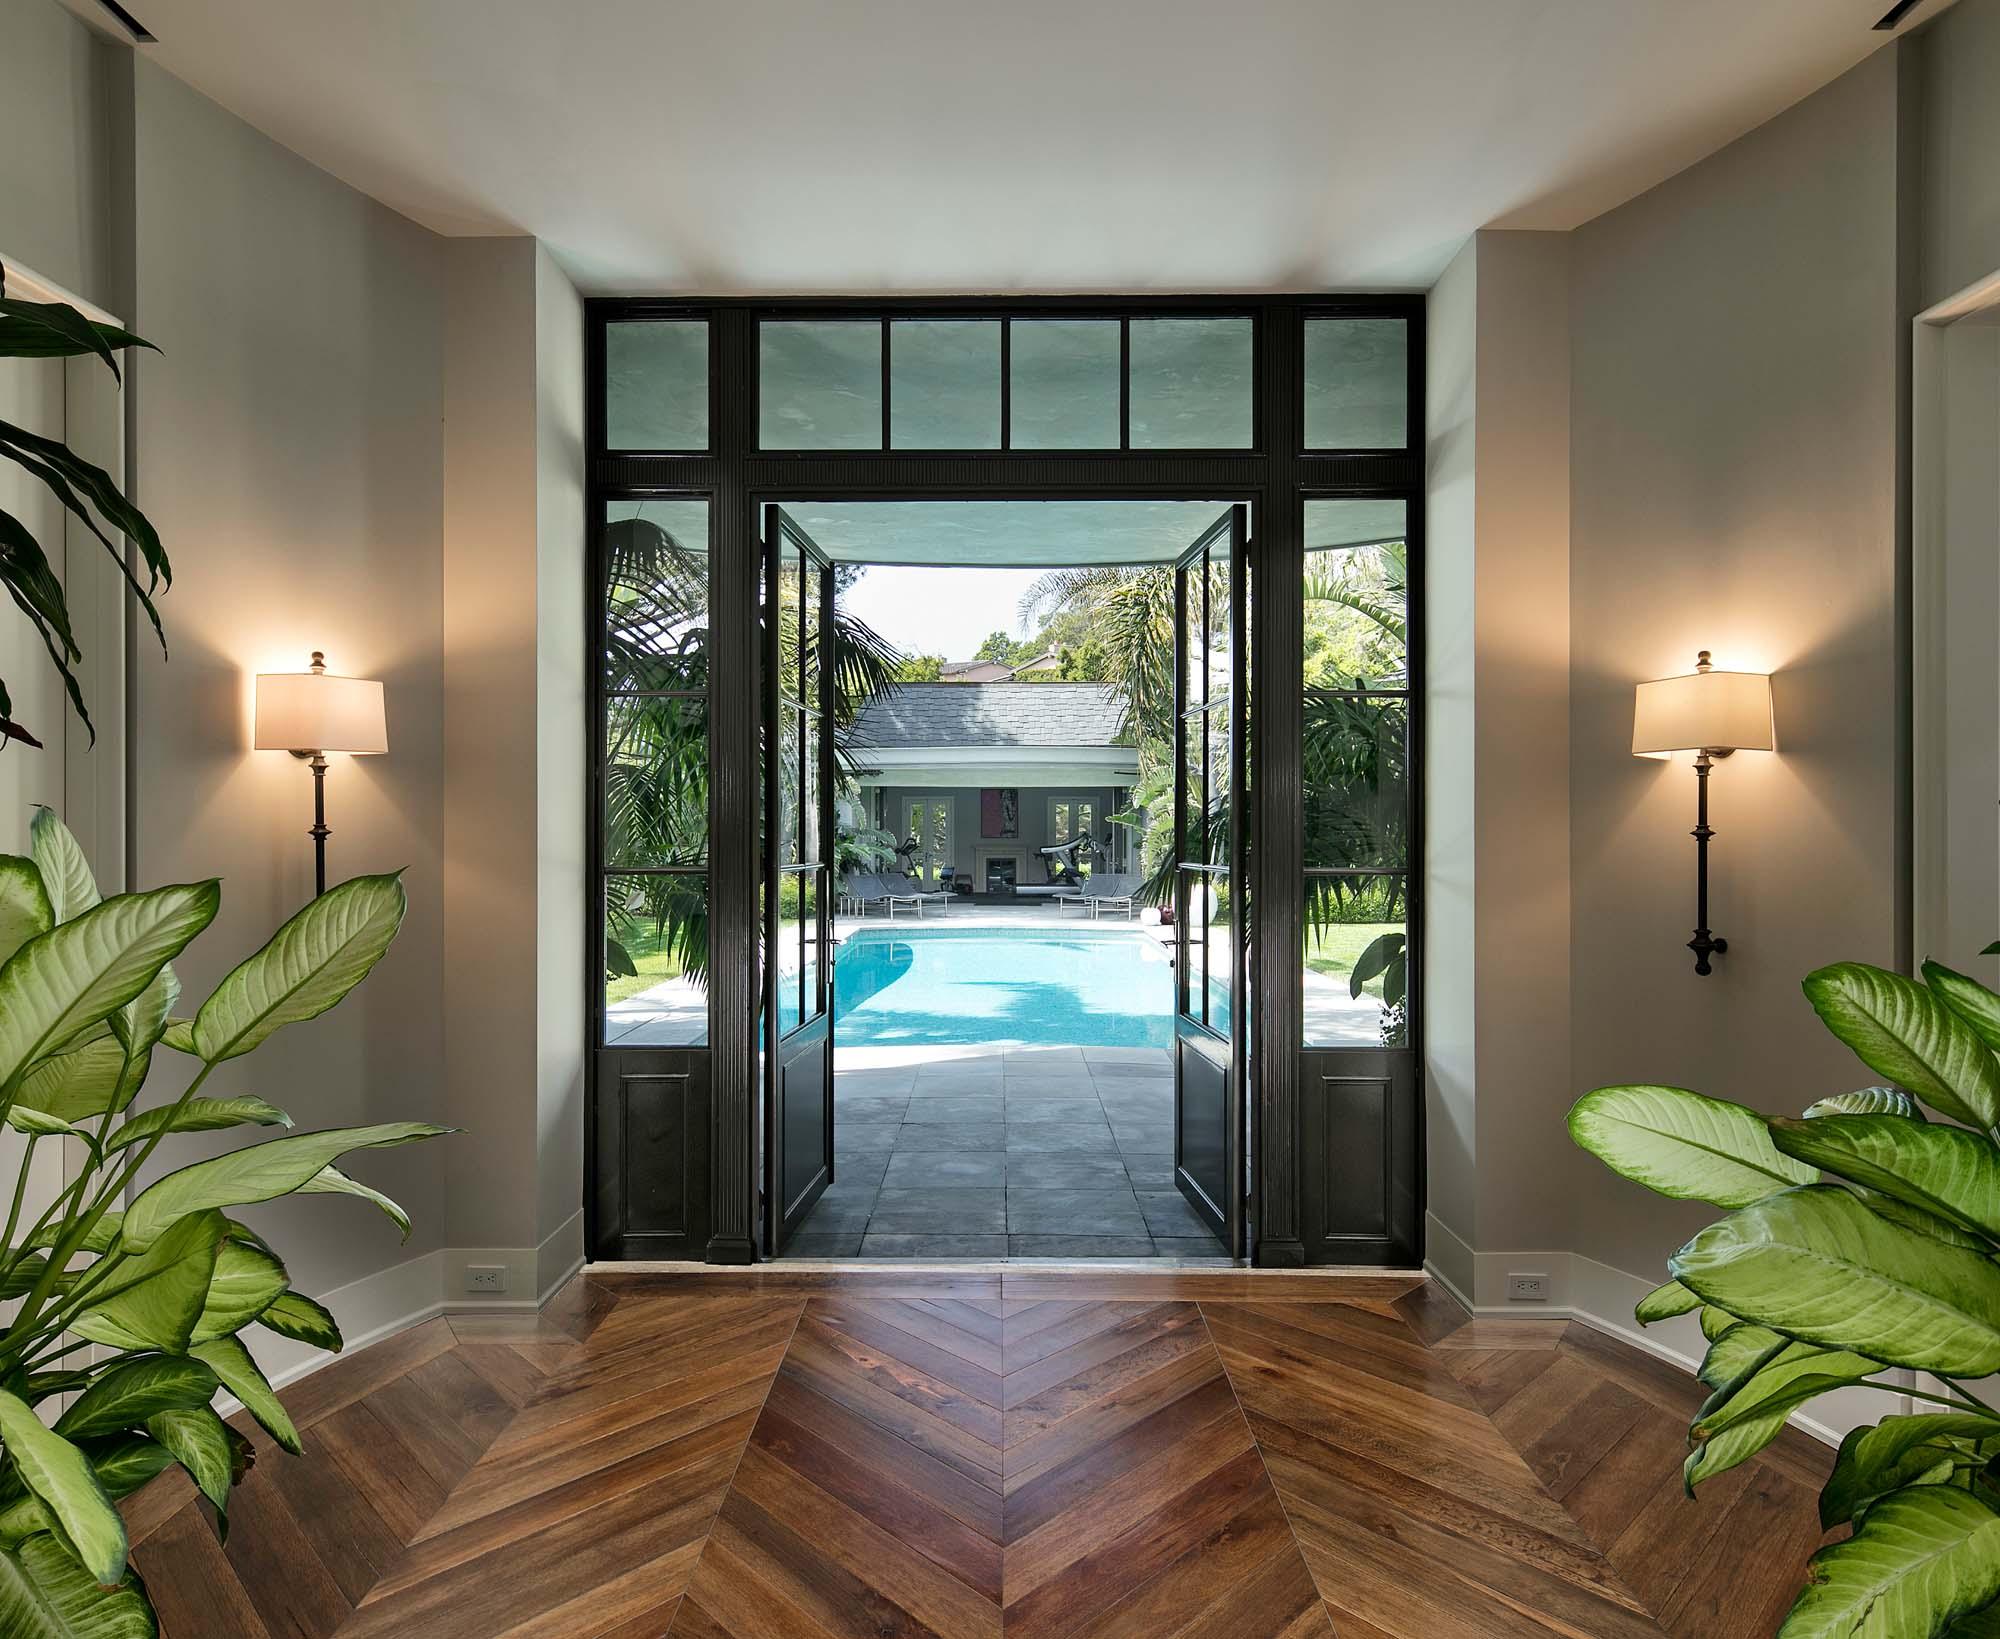 Door to Pool from Main House.jpg